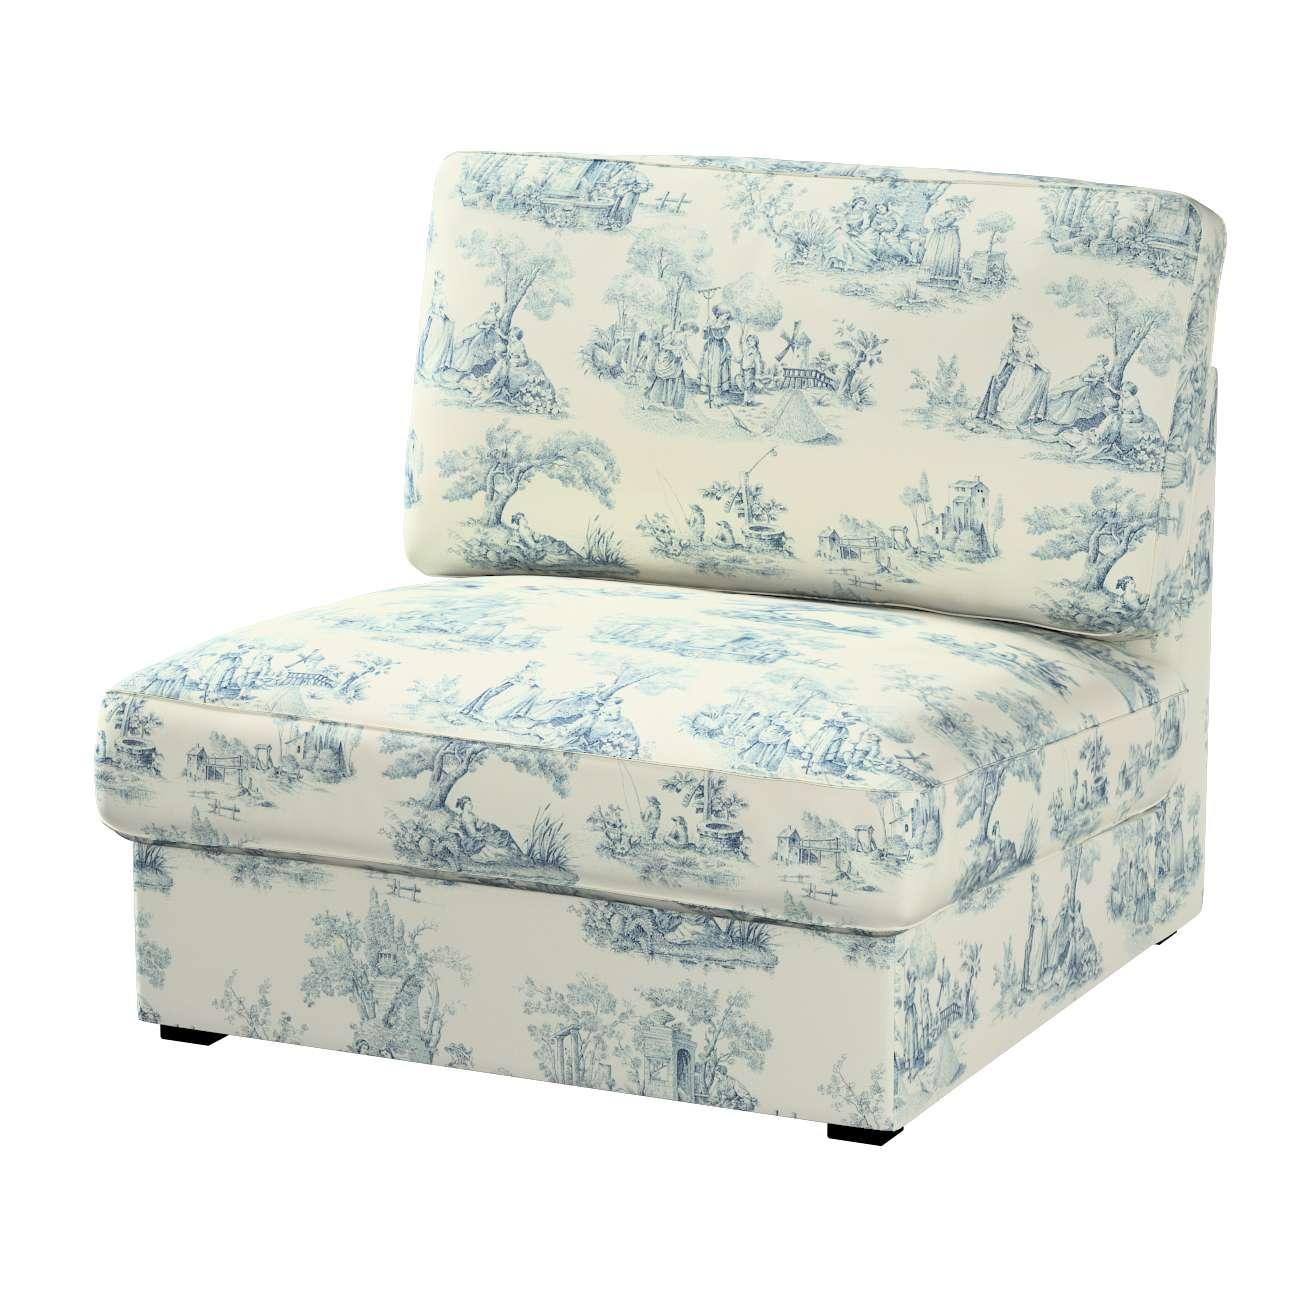 Pokrowiec na fotel Kivik Fotel Kivik w kolekcji Avinon, tkanina: 132-66